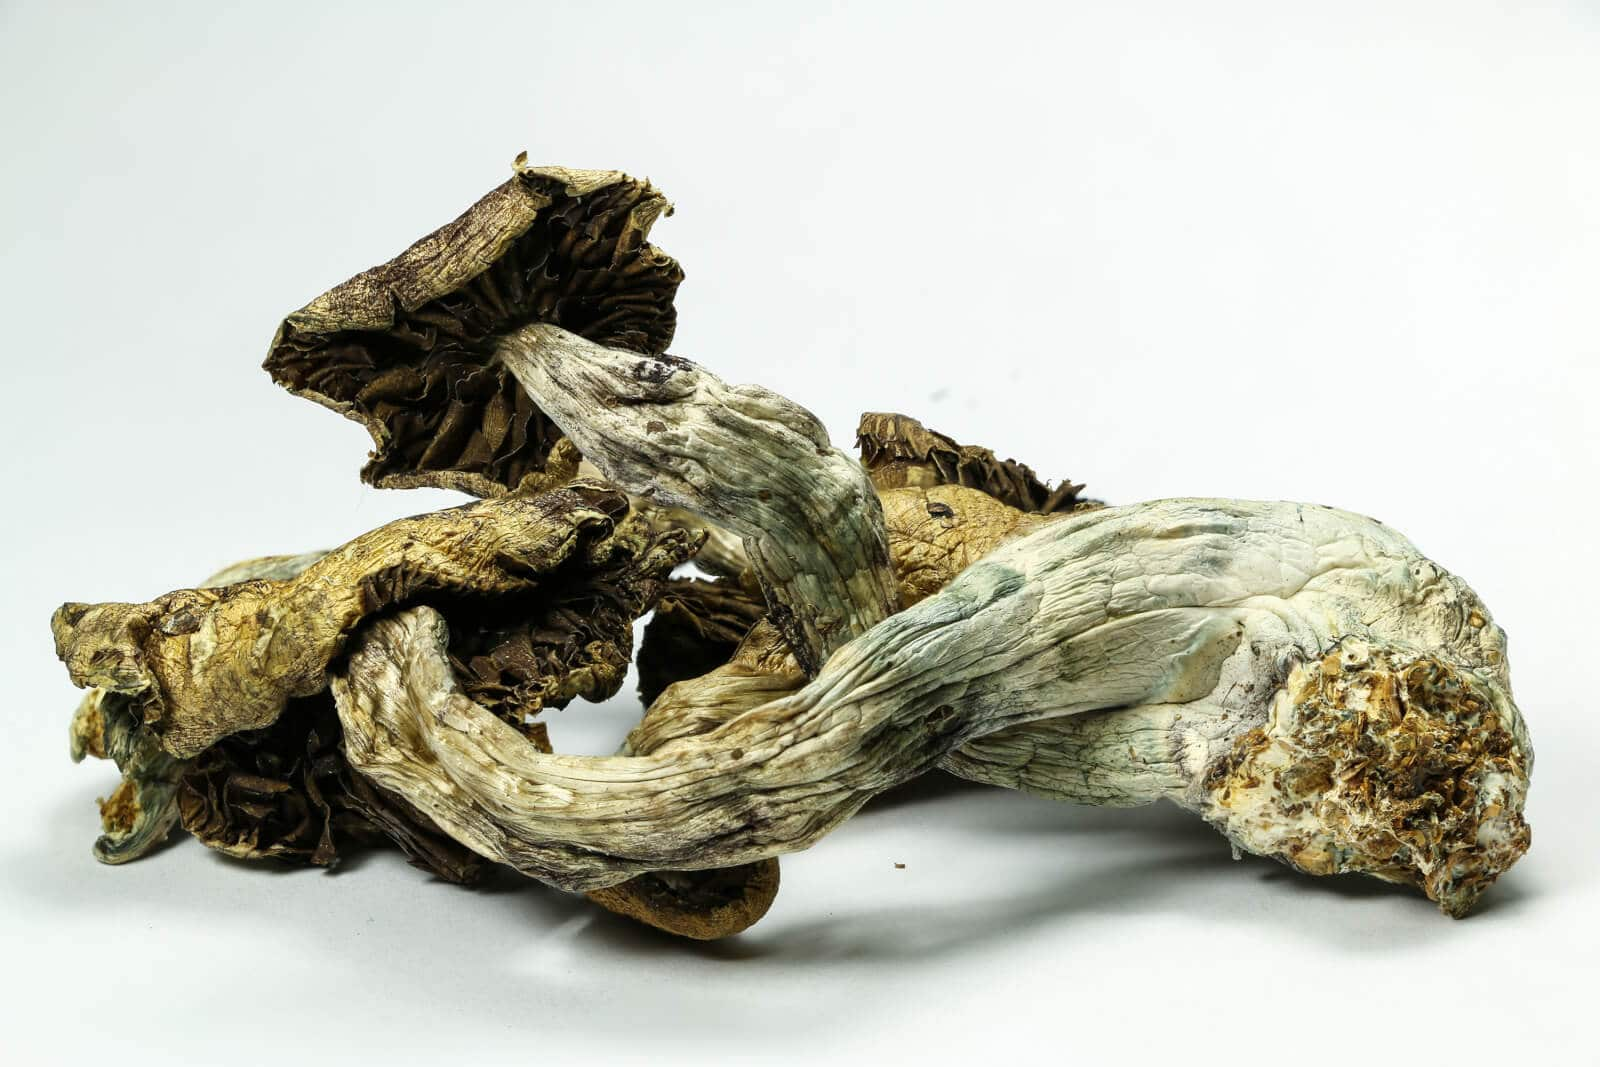 Thumbnail of Psilocybin Mushrooms Addiction, Abuse, And Treatment